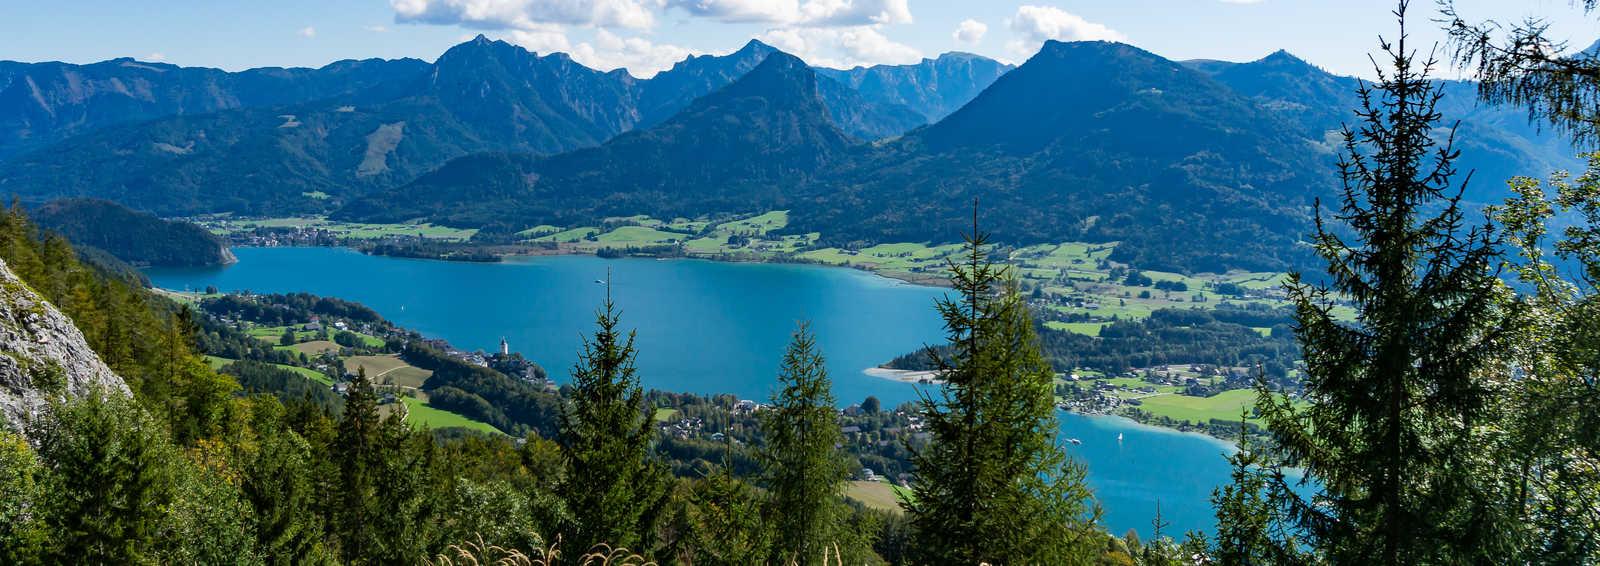 Wolfgangsee lake, Salzkammergut, Austria